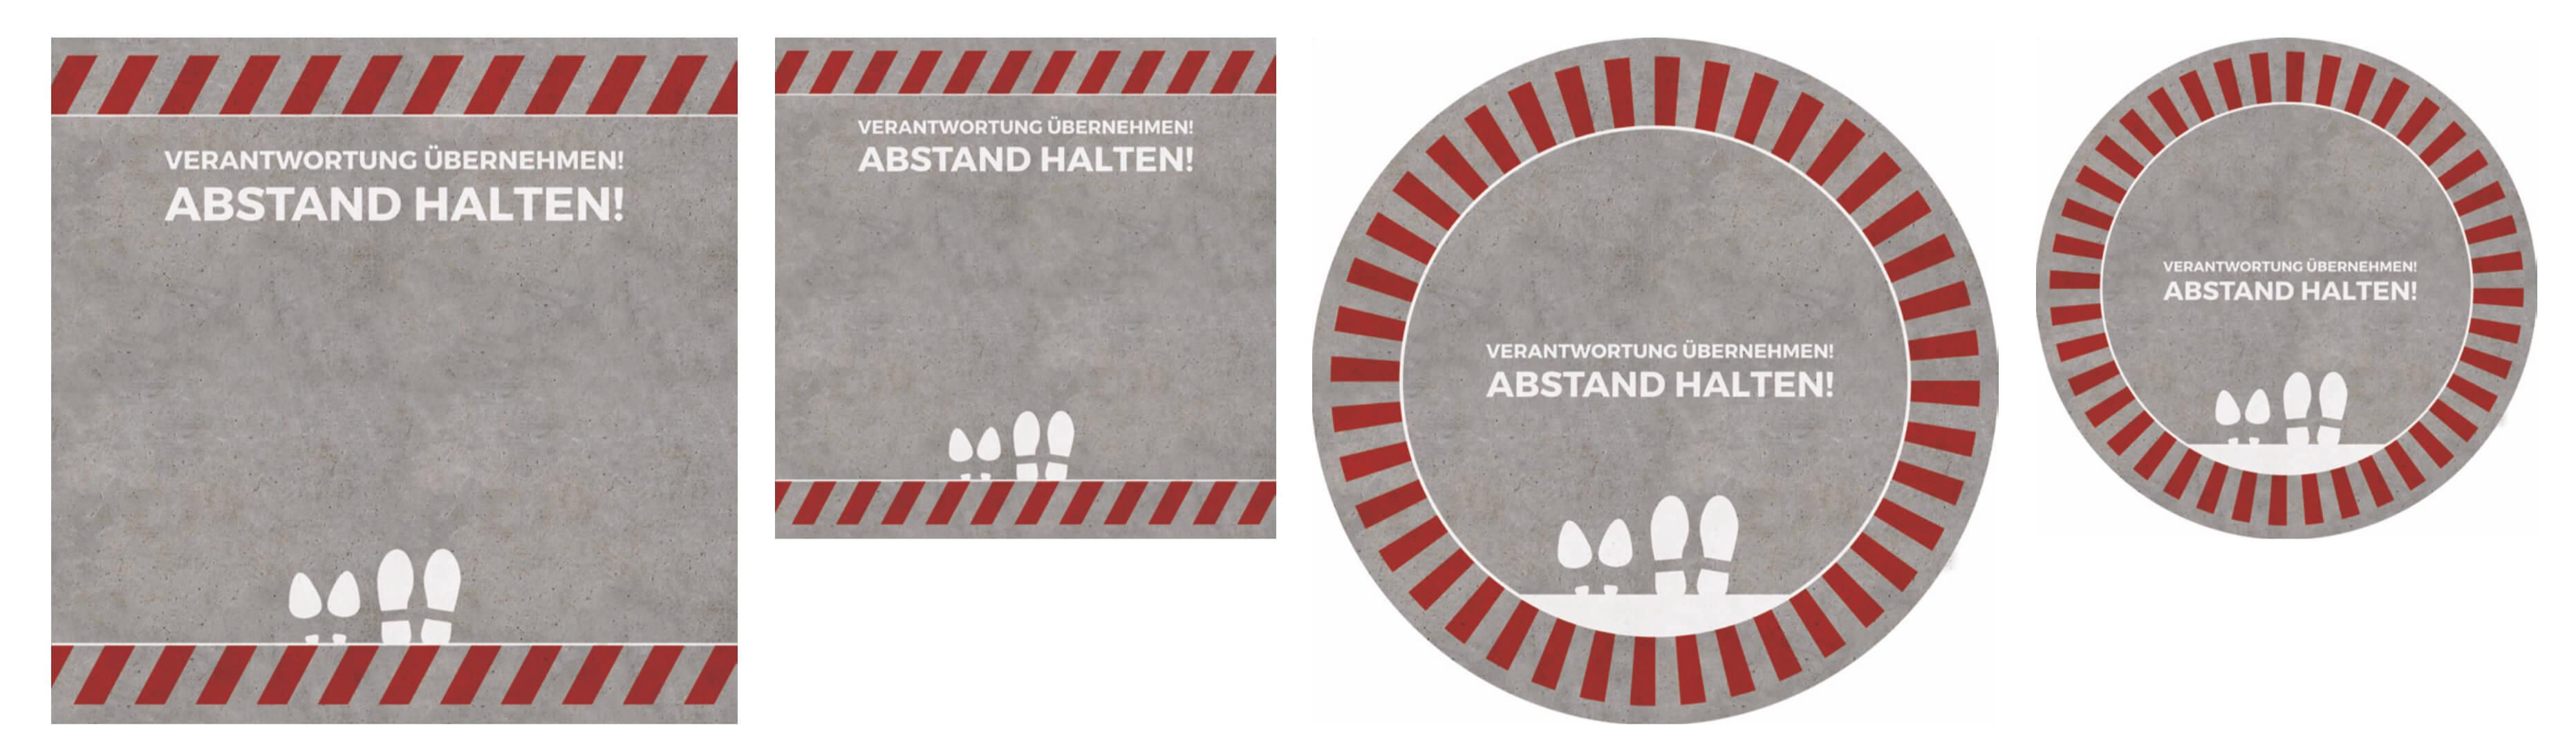 Bodenmatten Abstand halten Set